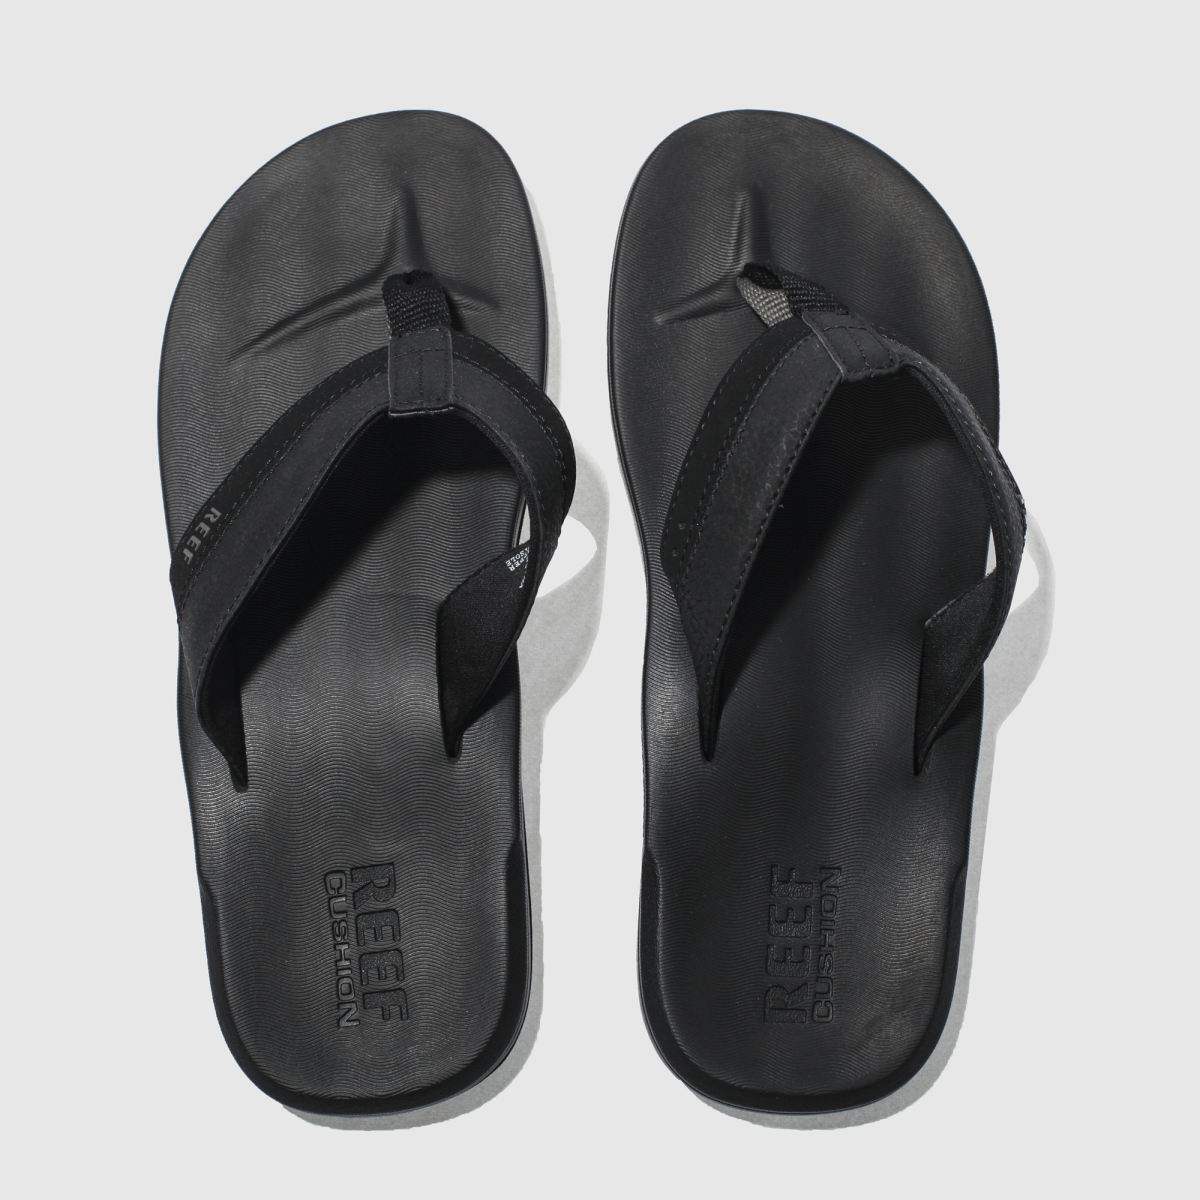 Reef Reef Black Contoured Cushion Sandals